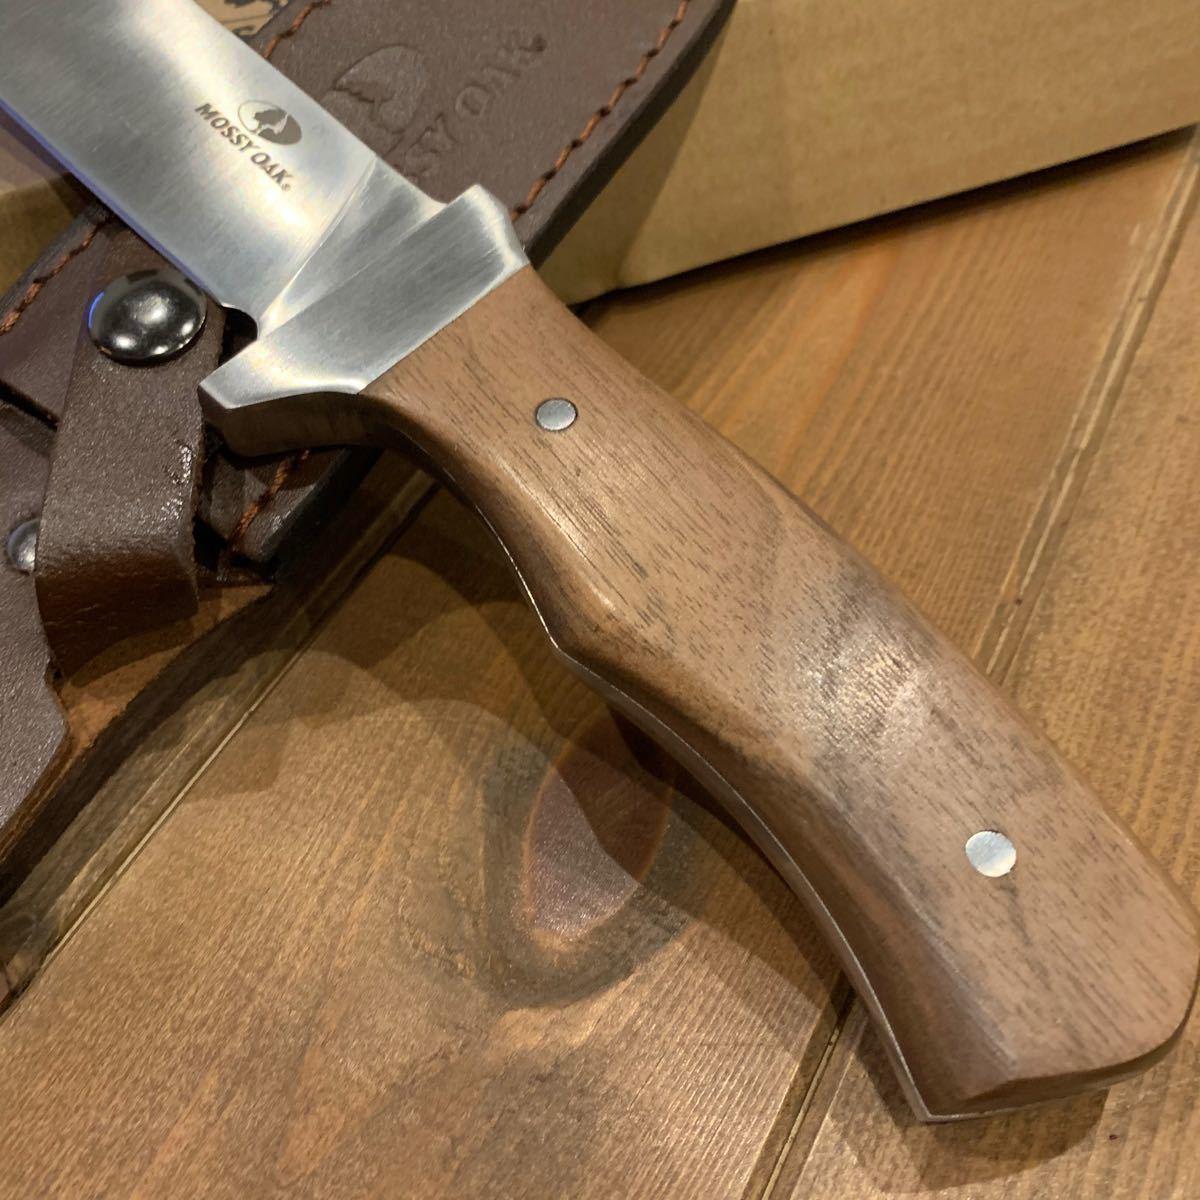 MOSSY OAK ナイフ シースナイフ フルタング 天然木ハンドル